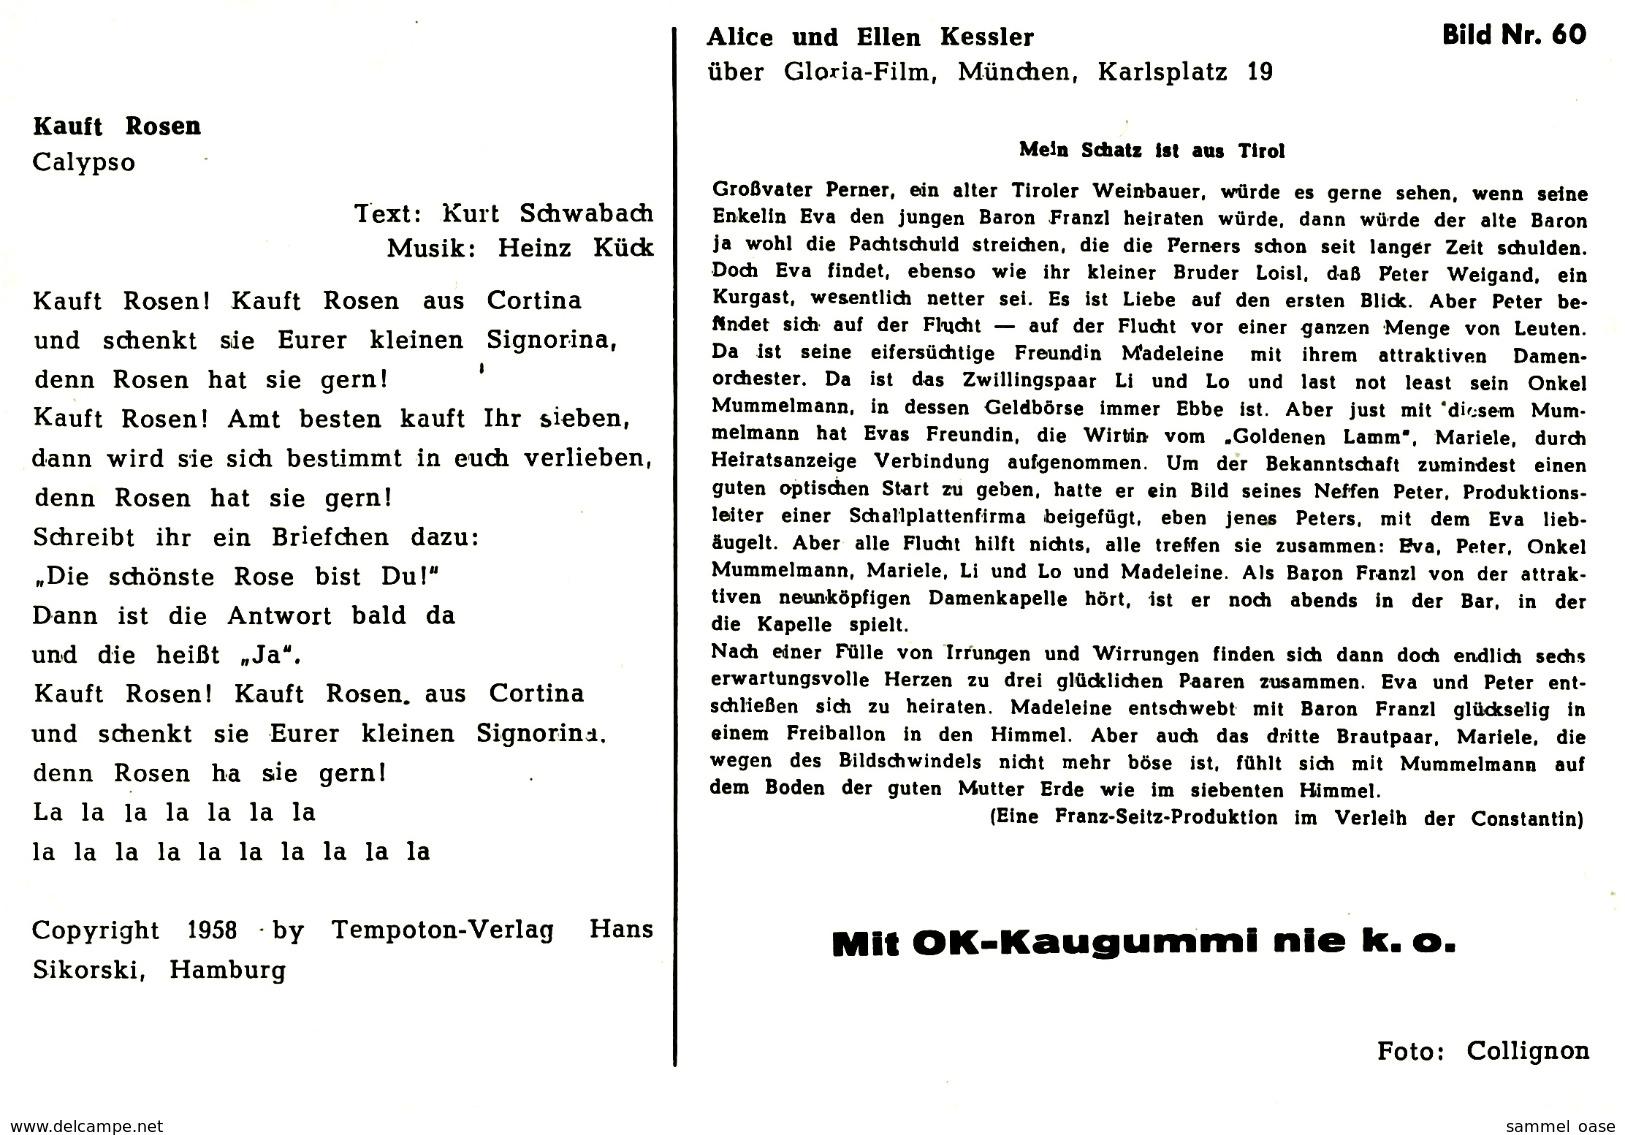 Ca. 1958  -  Sammelbild OK-Kaugummi  -  Ruth Leuwerik  -  Bild Nr. 11 - Süsswaren